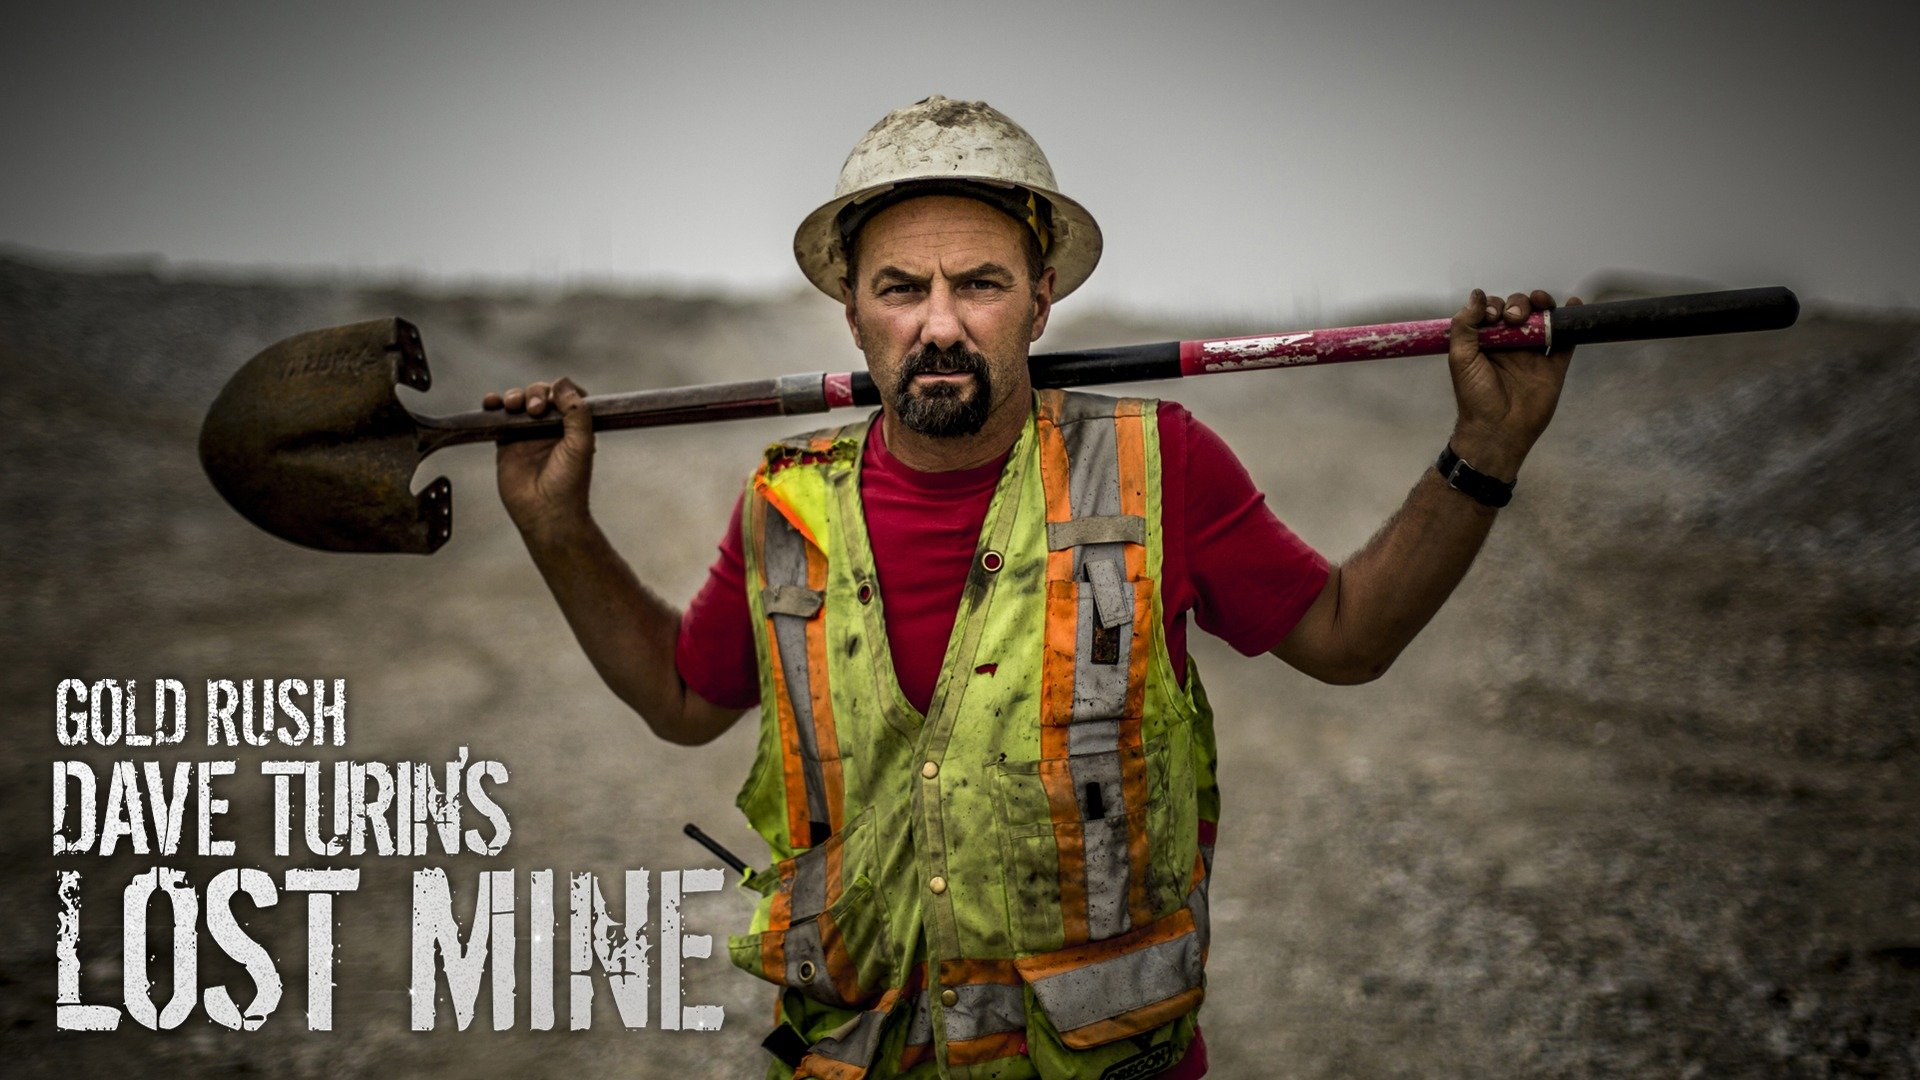 Gold Rush: Dave Turin's Lost Mine